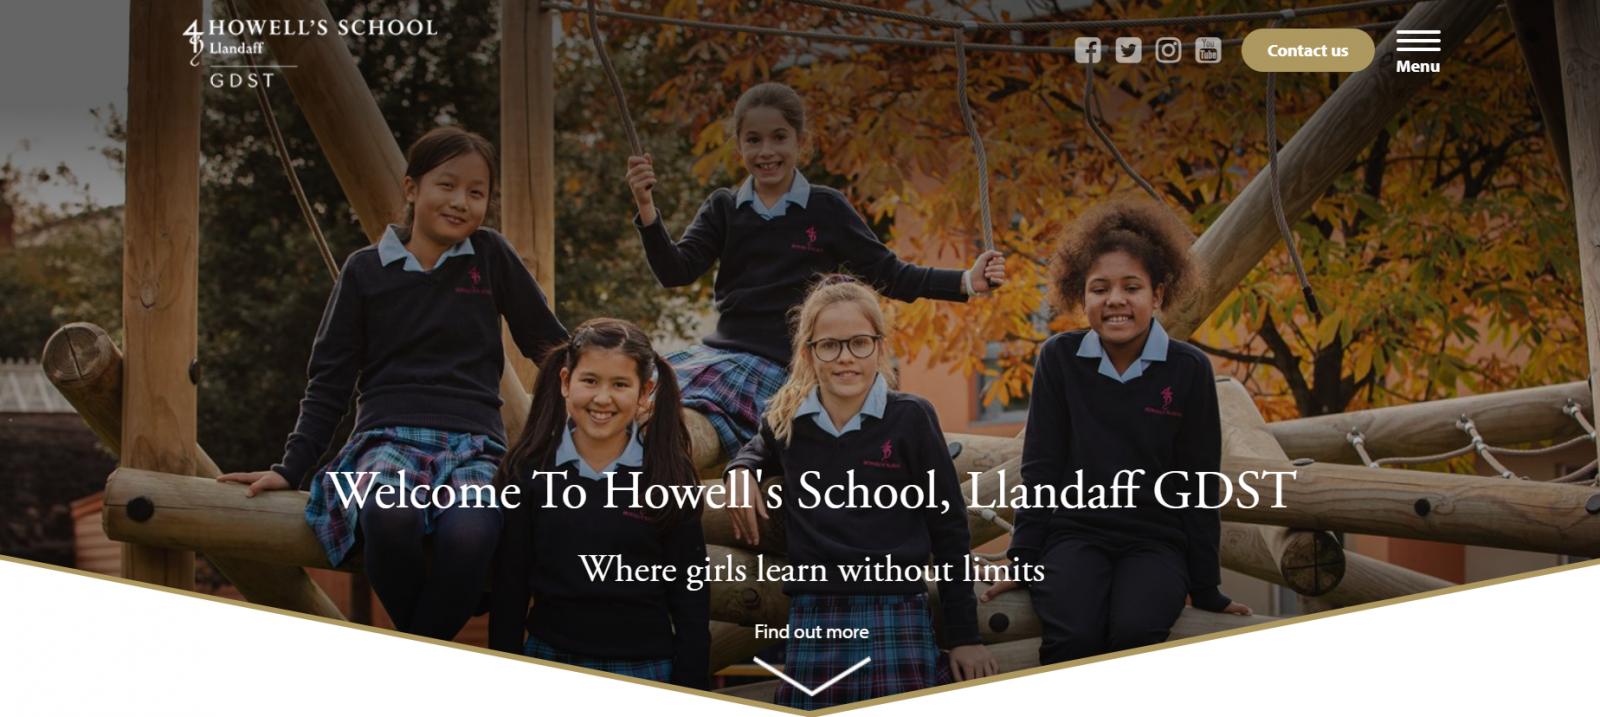 Howell's School Llandaff GDST